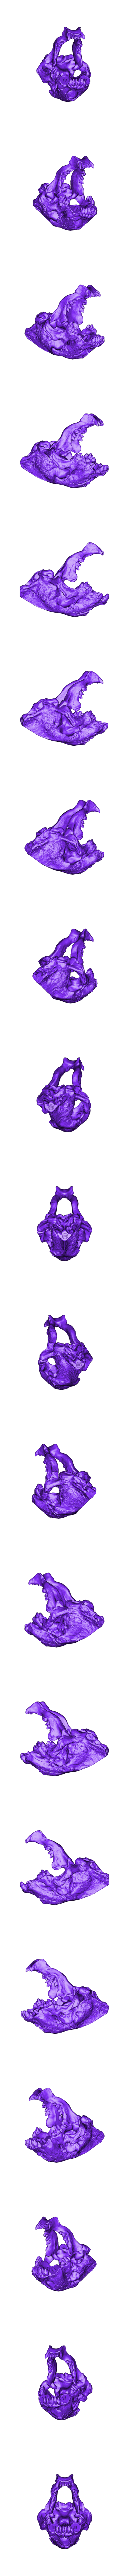 Tiara_Skull.stl Download free STL file Storied Skulls Crown and Tiara • 3D printer model, alterboy987